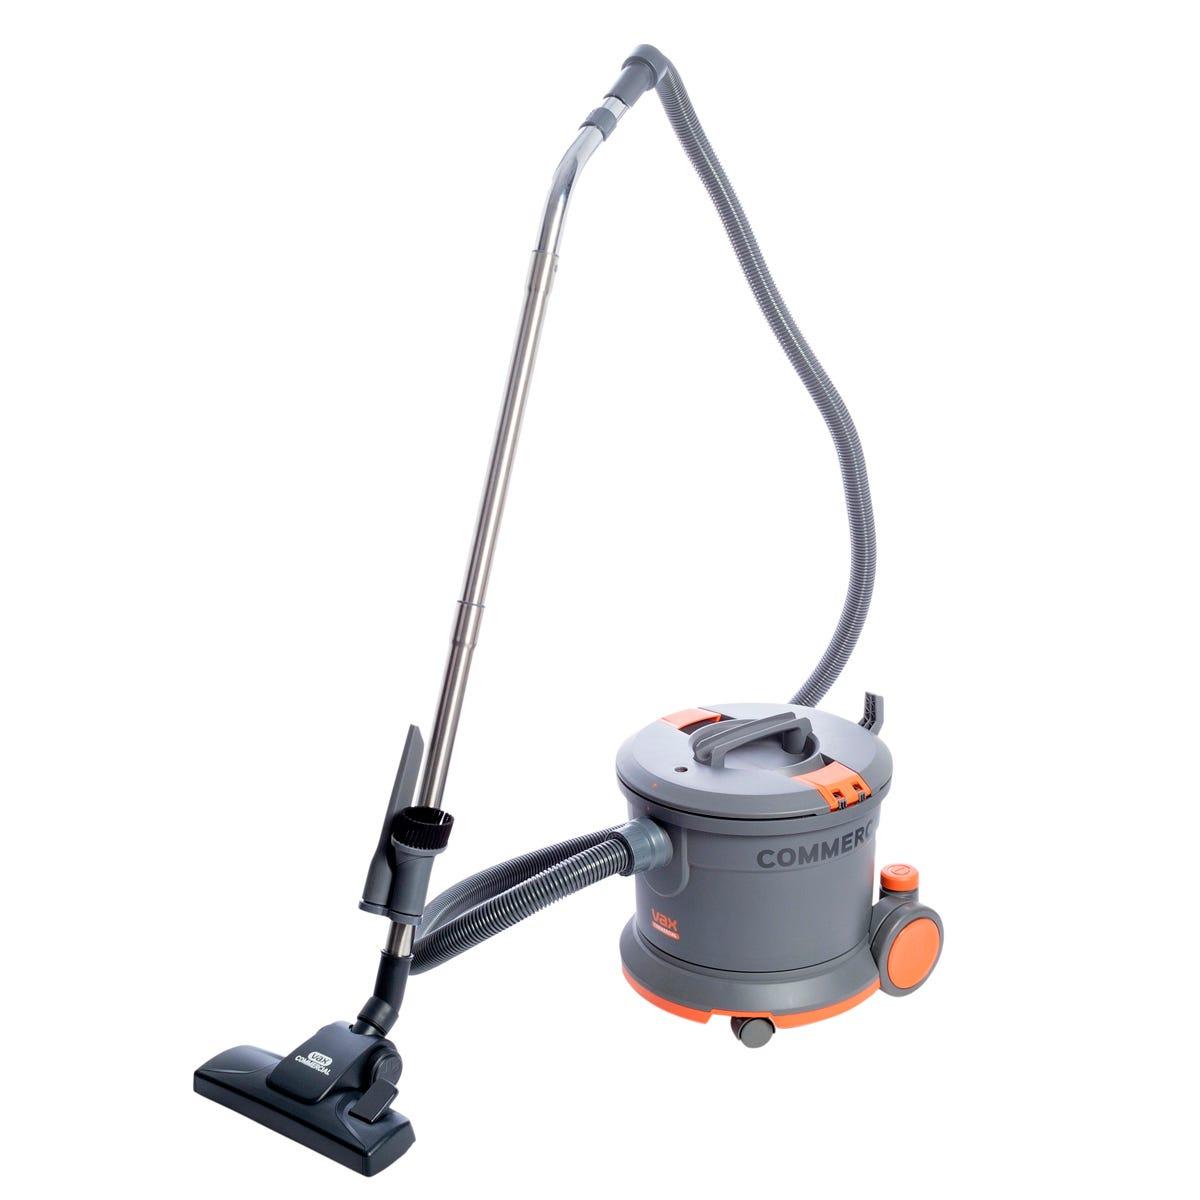 Vax Bagged Vacuum Cleaner 800W Tub - 9L